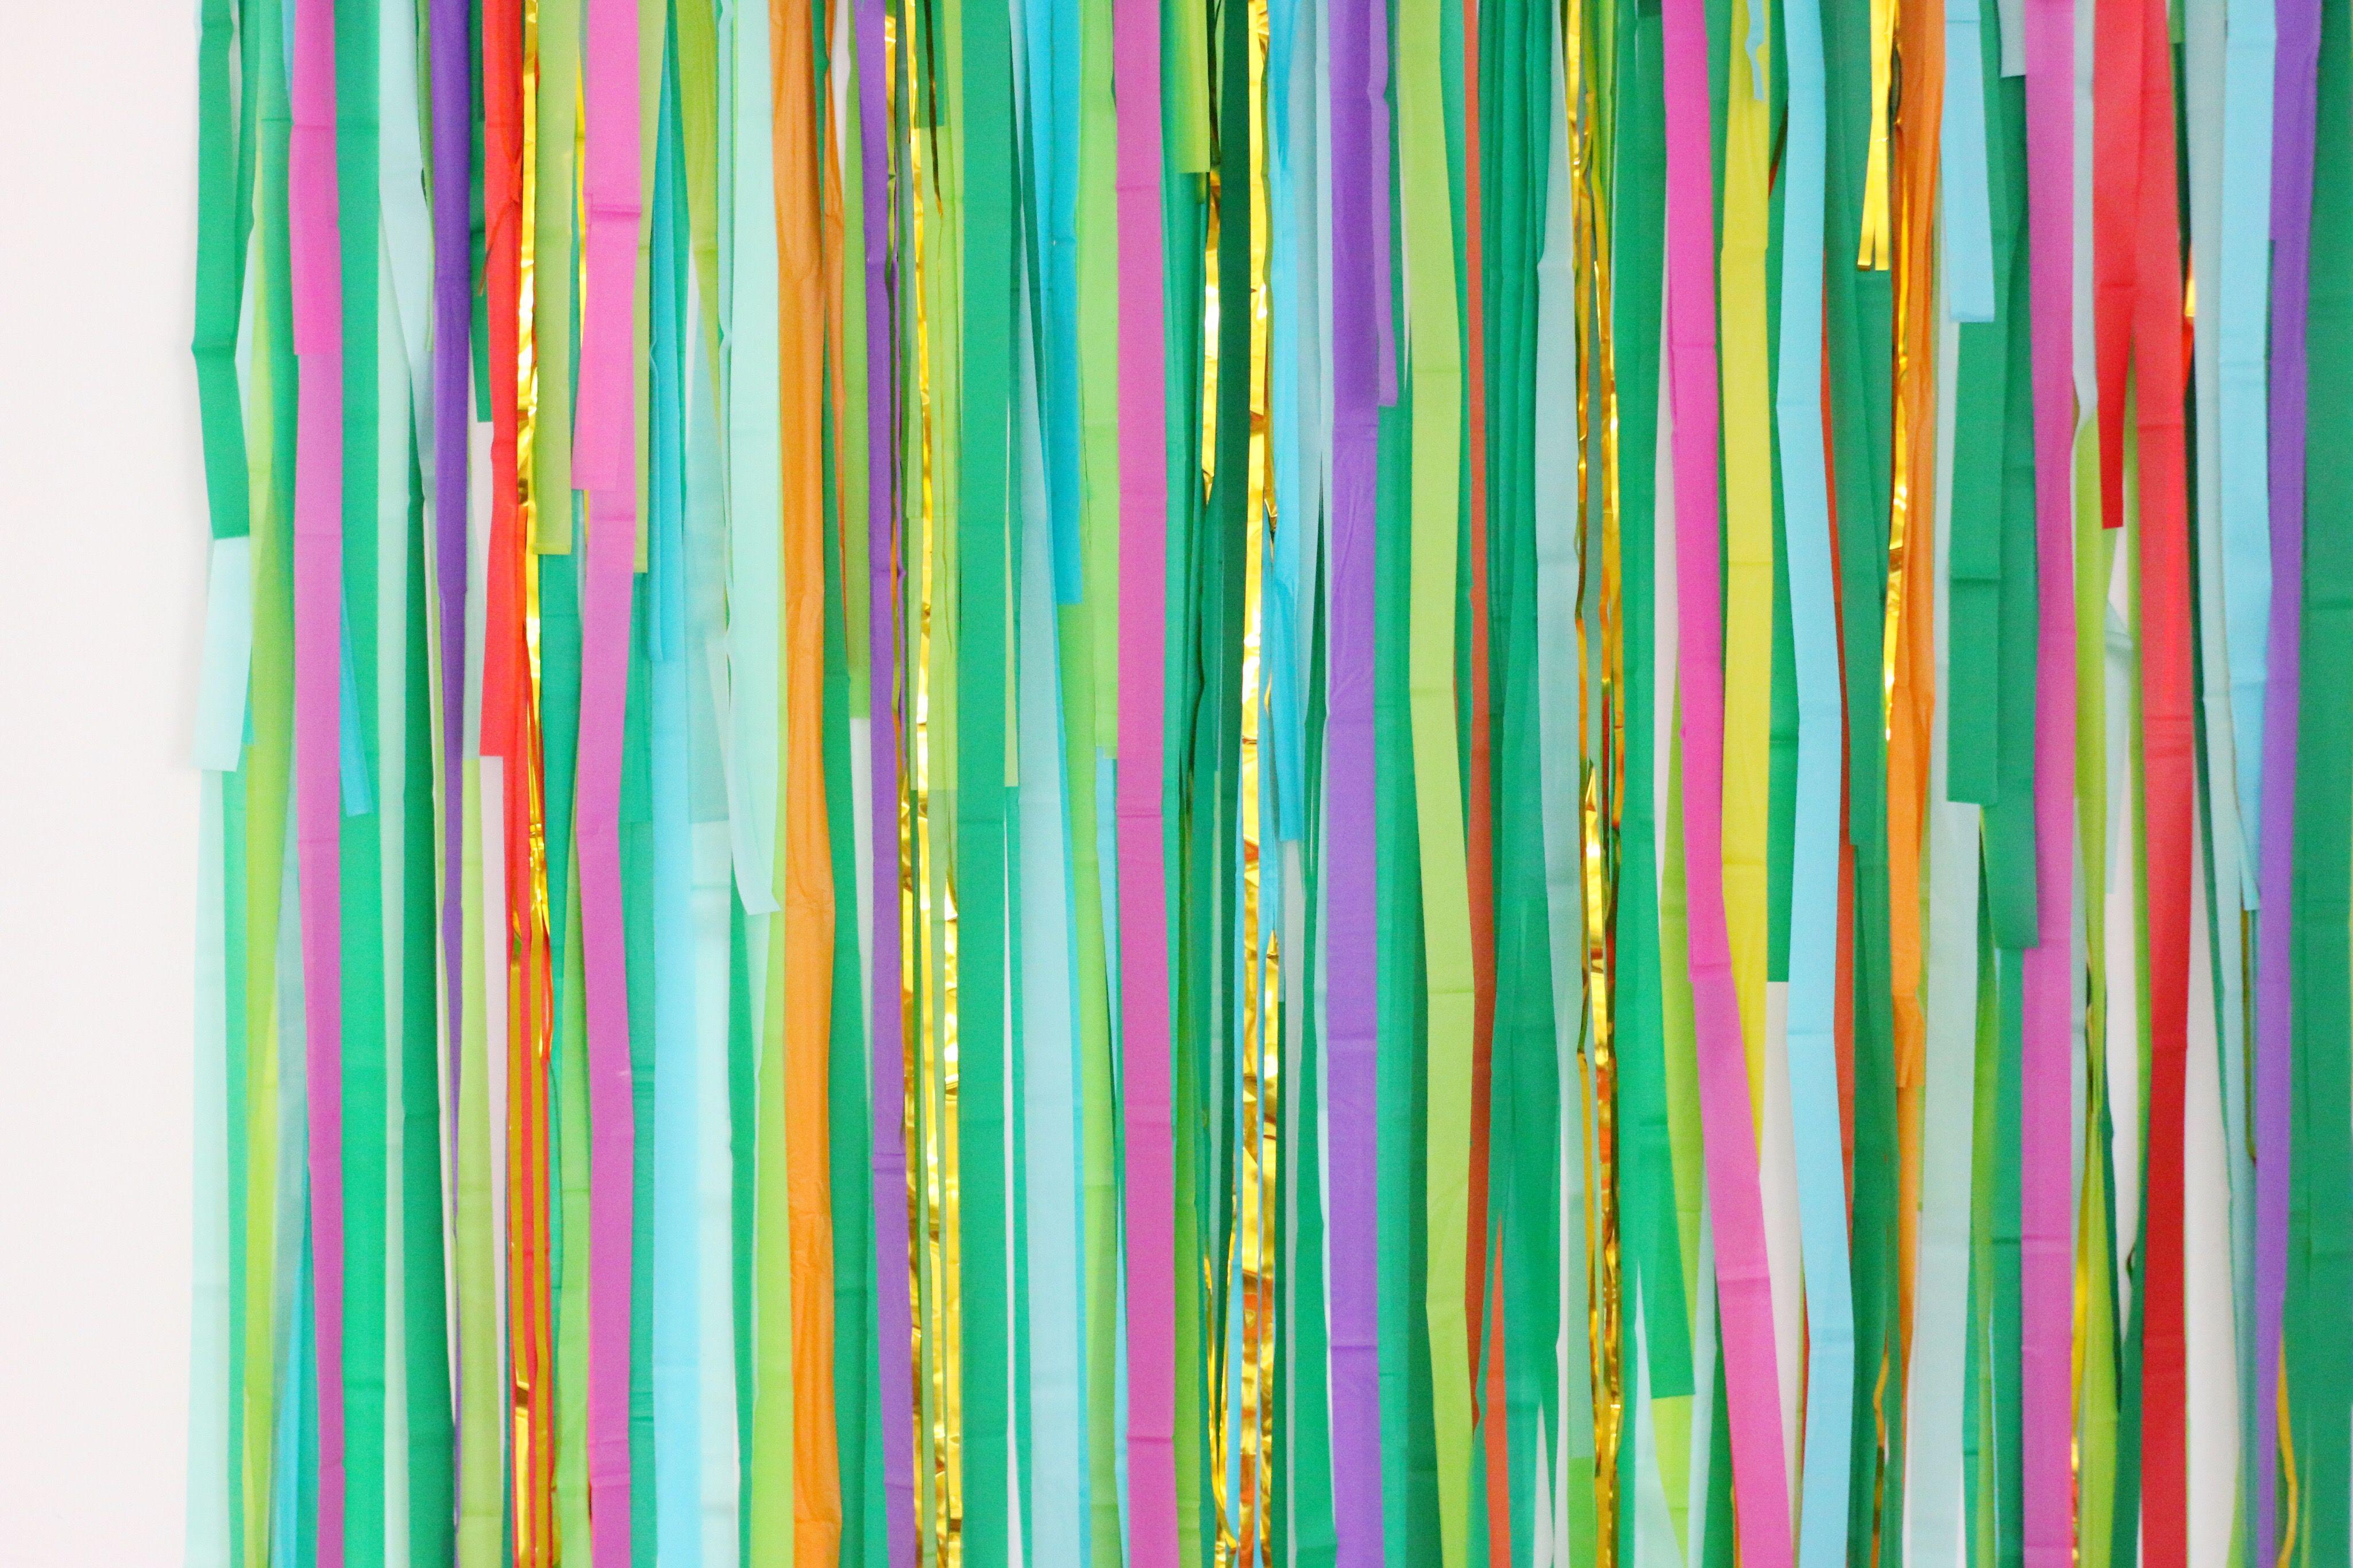 Colorful Fringe Backdrop, Wedding Backdrop, Photo Booth Streamer Backdrop